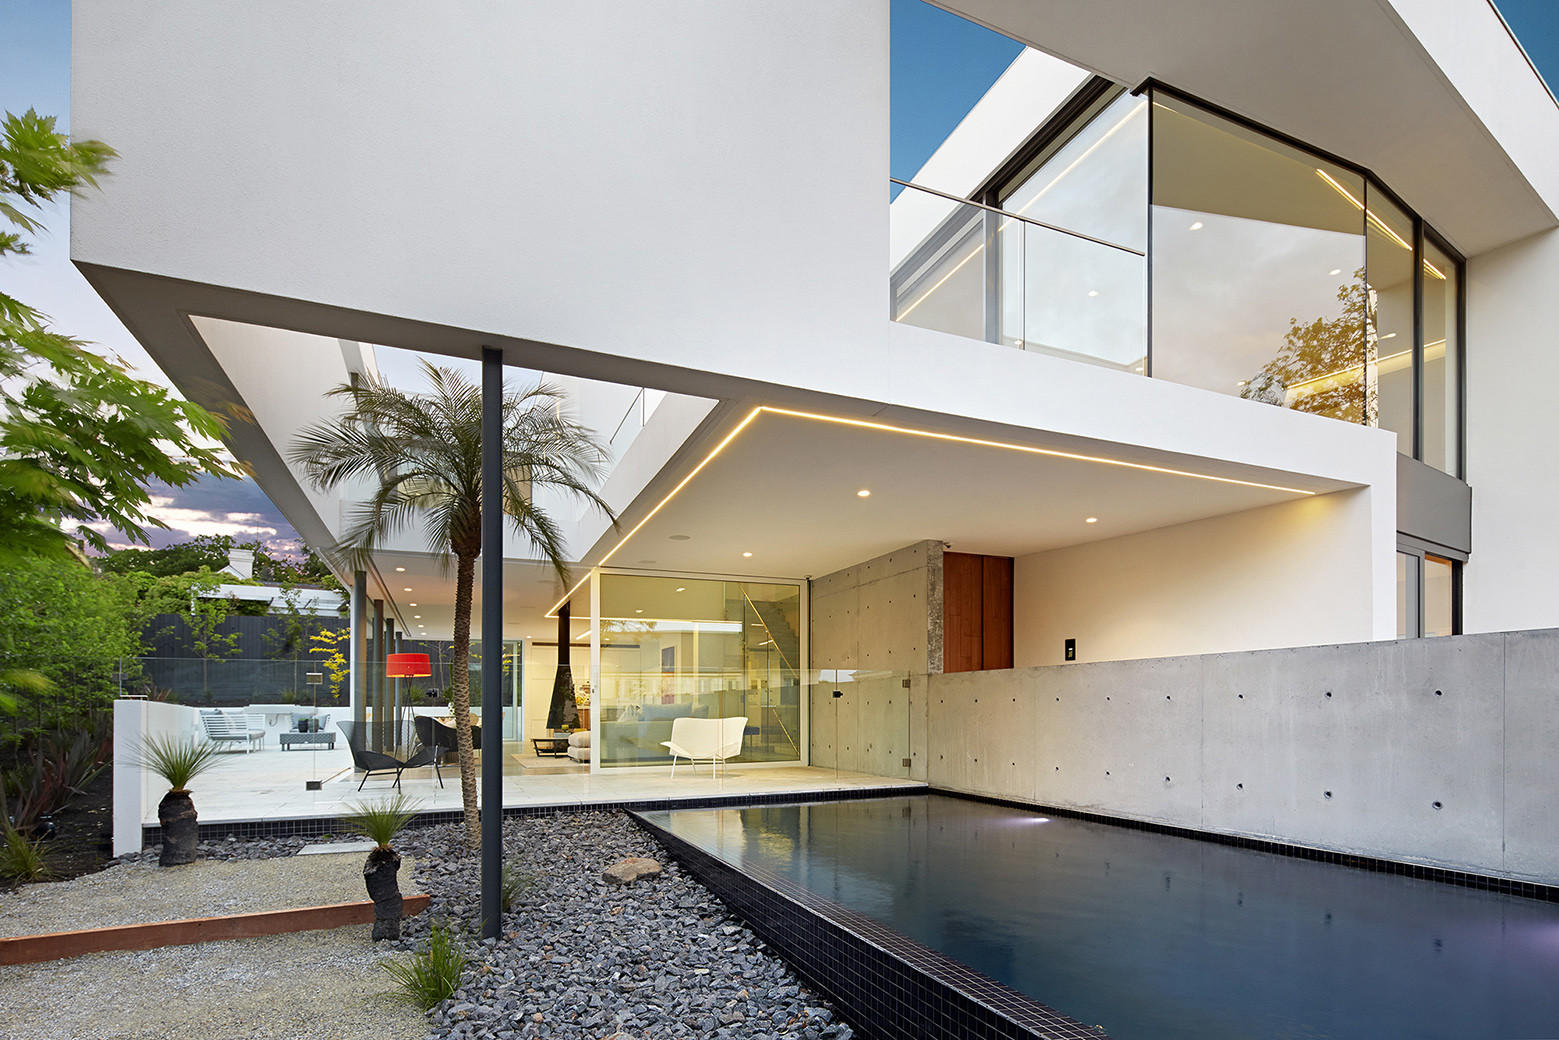 Casa Boandyne / SVMSTUDIO, © Andy Gibson